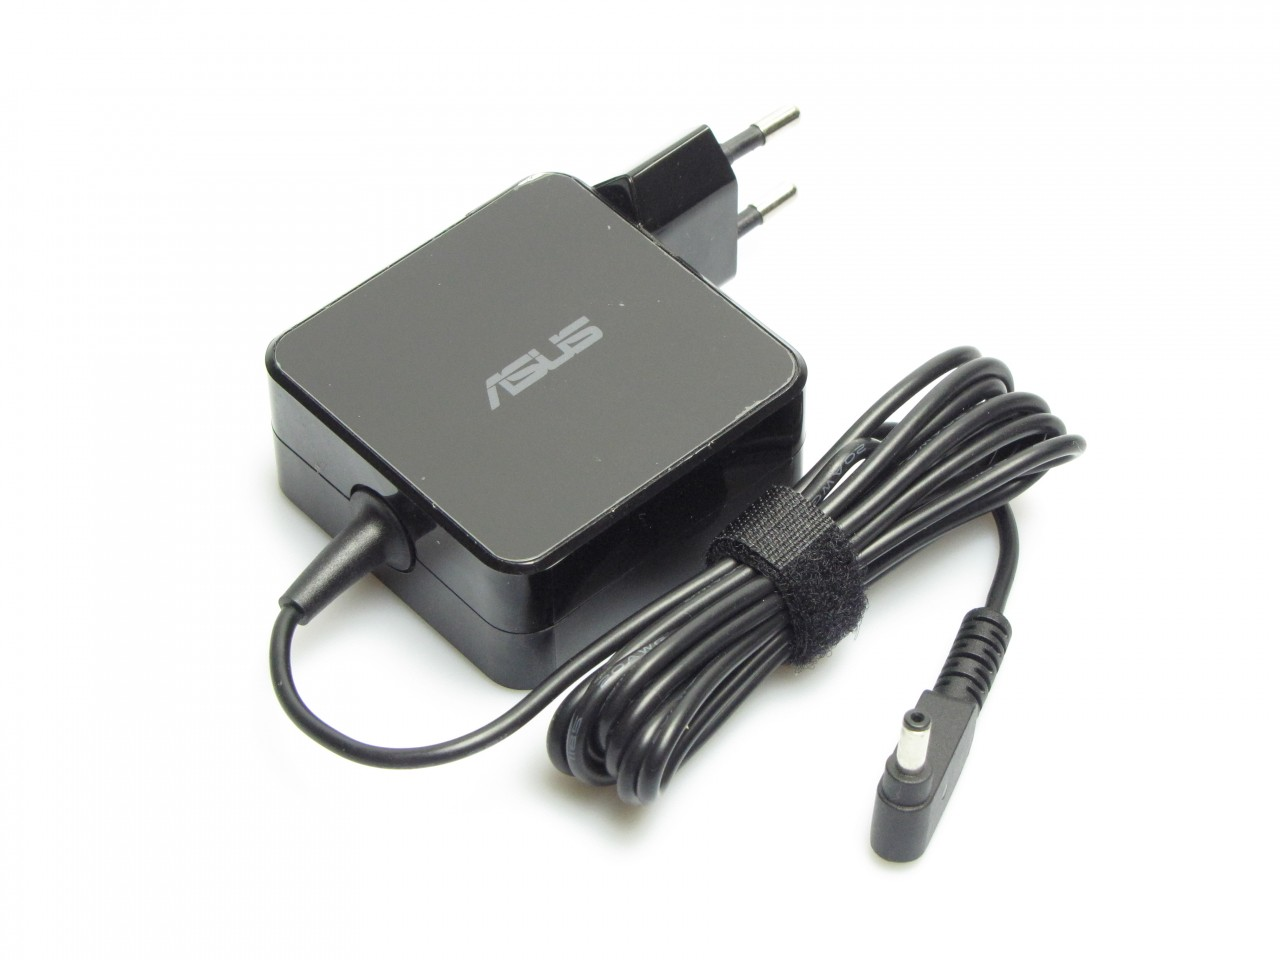 Incarcator Asus S430UF Square Shape 65W imagine powerlaptop.ro 2021